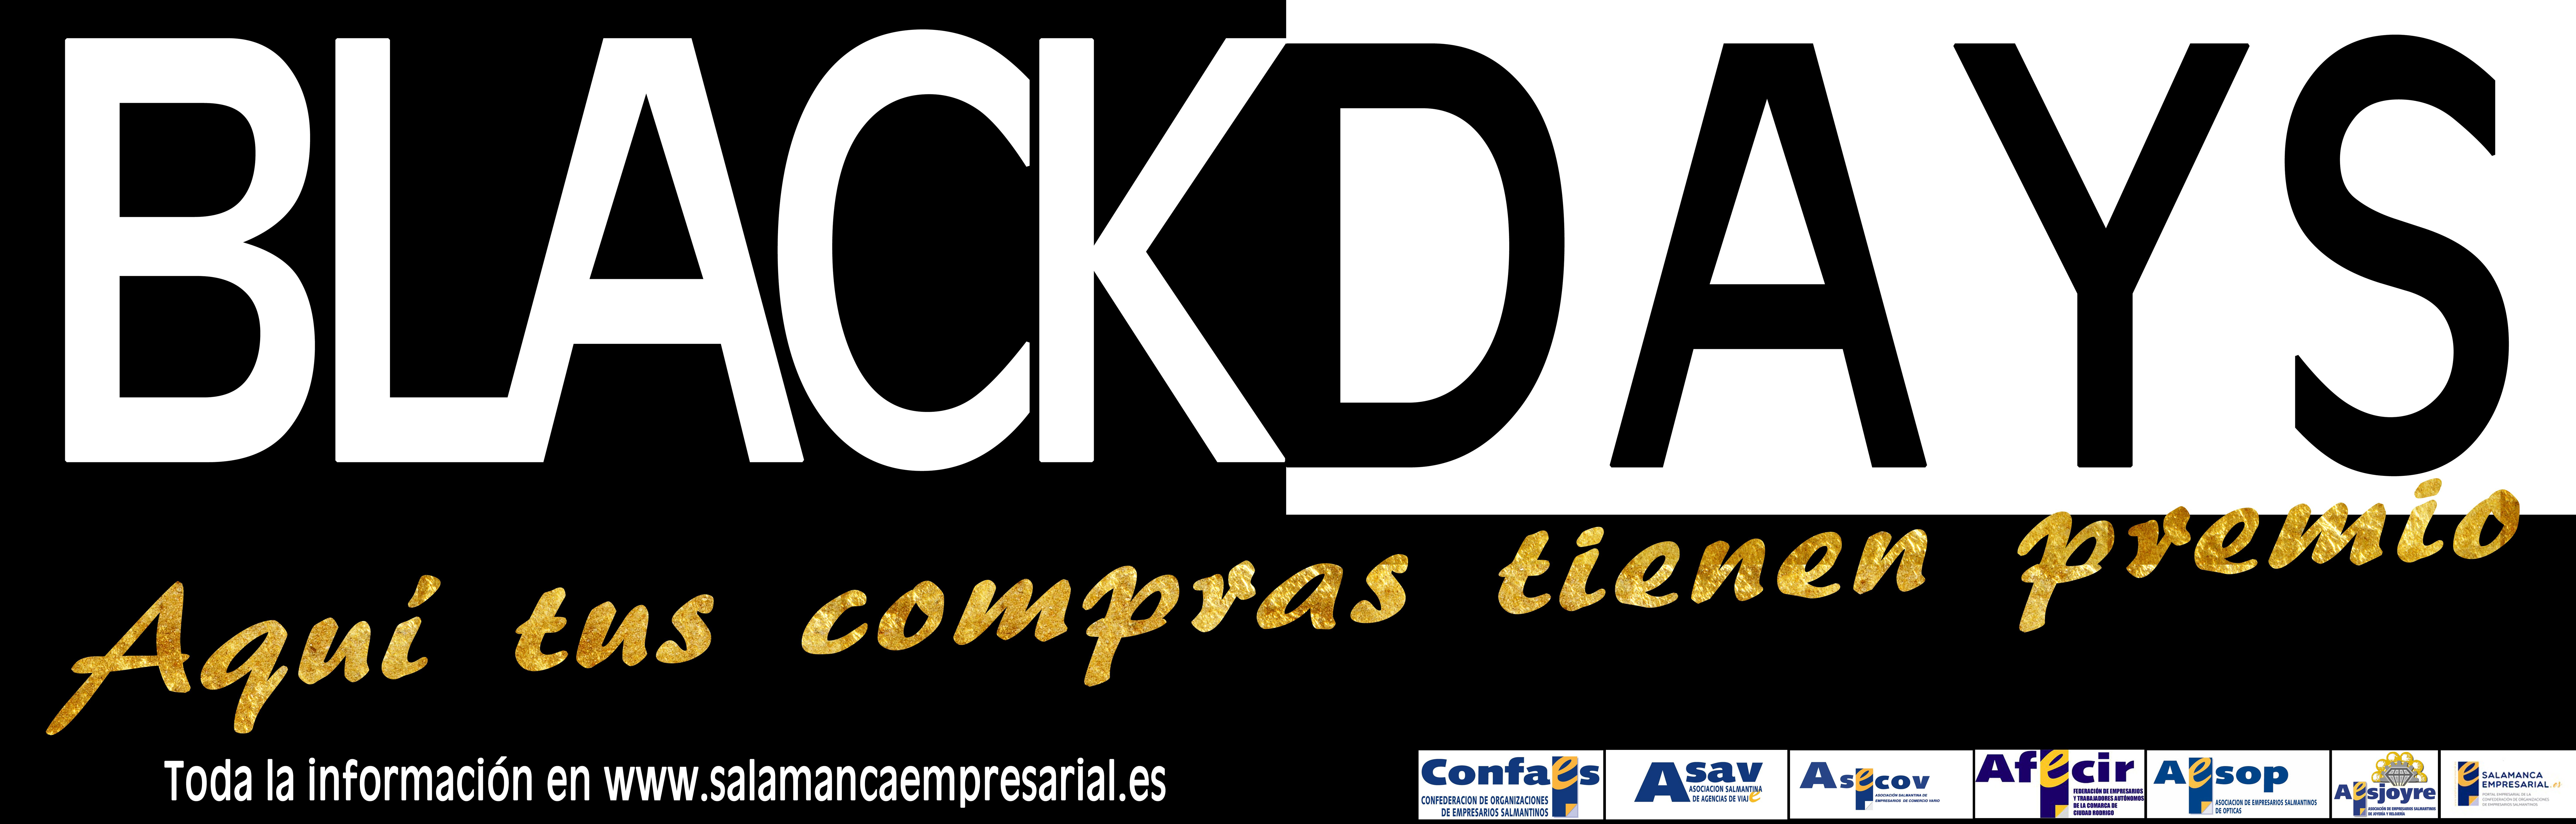 blackdays_ IMPRESION_black